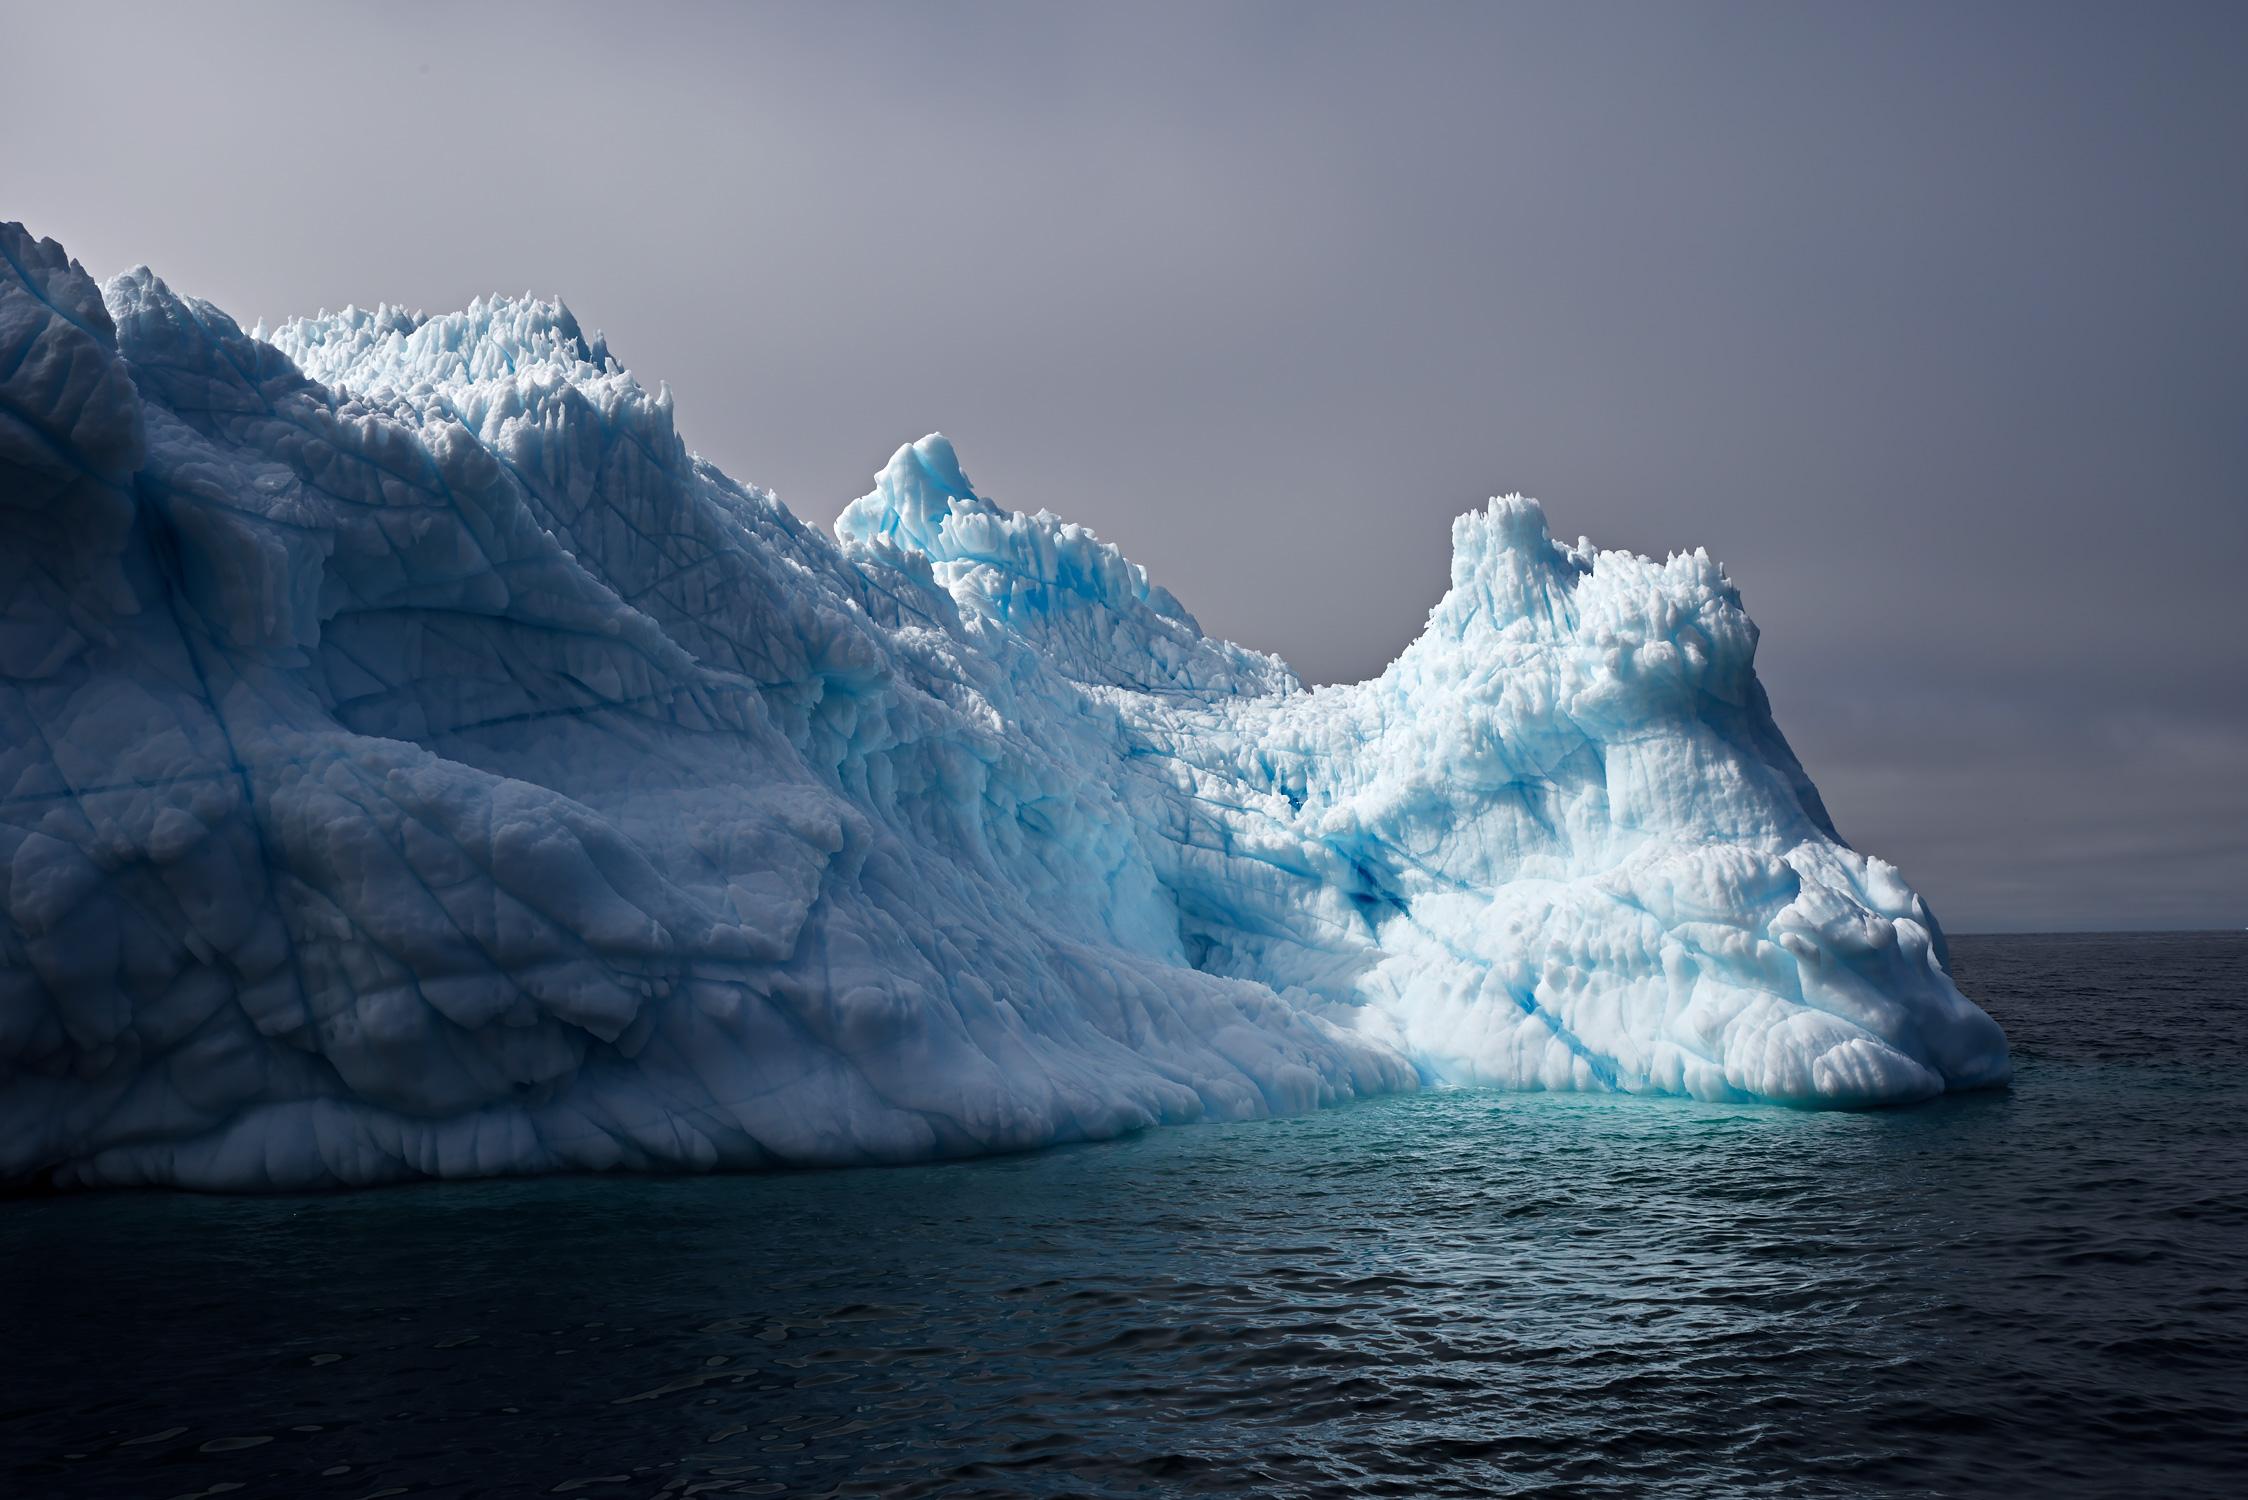 Furrowed Iceberg In The Twilight